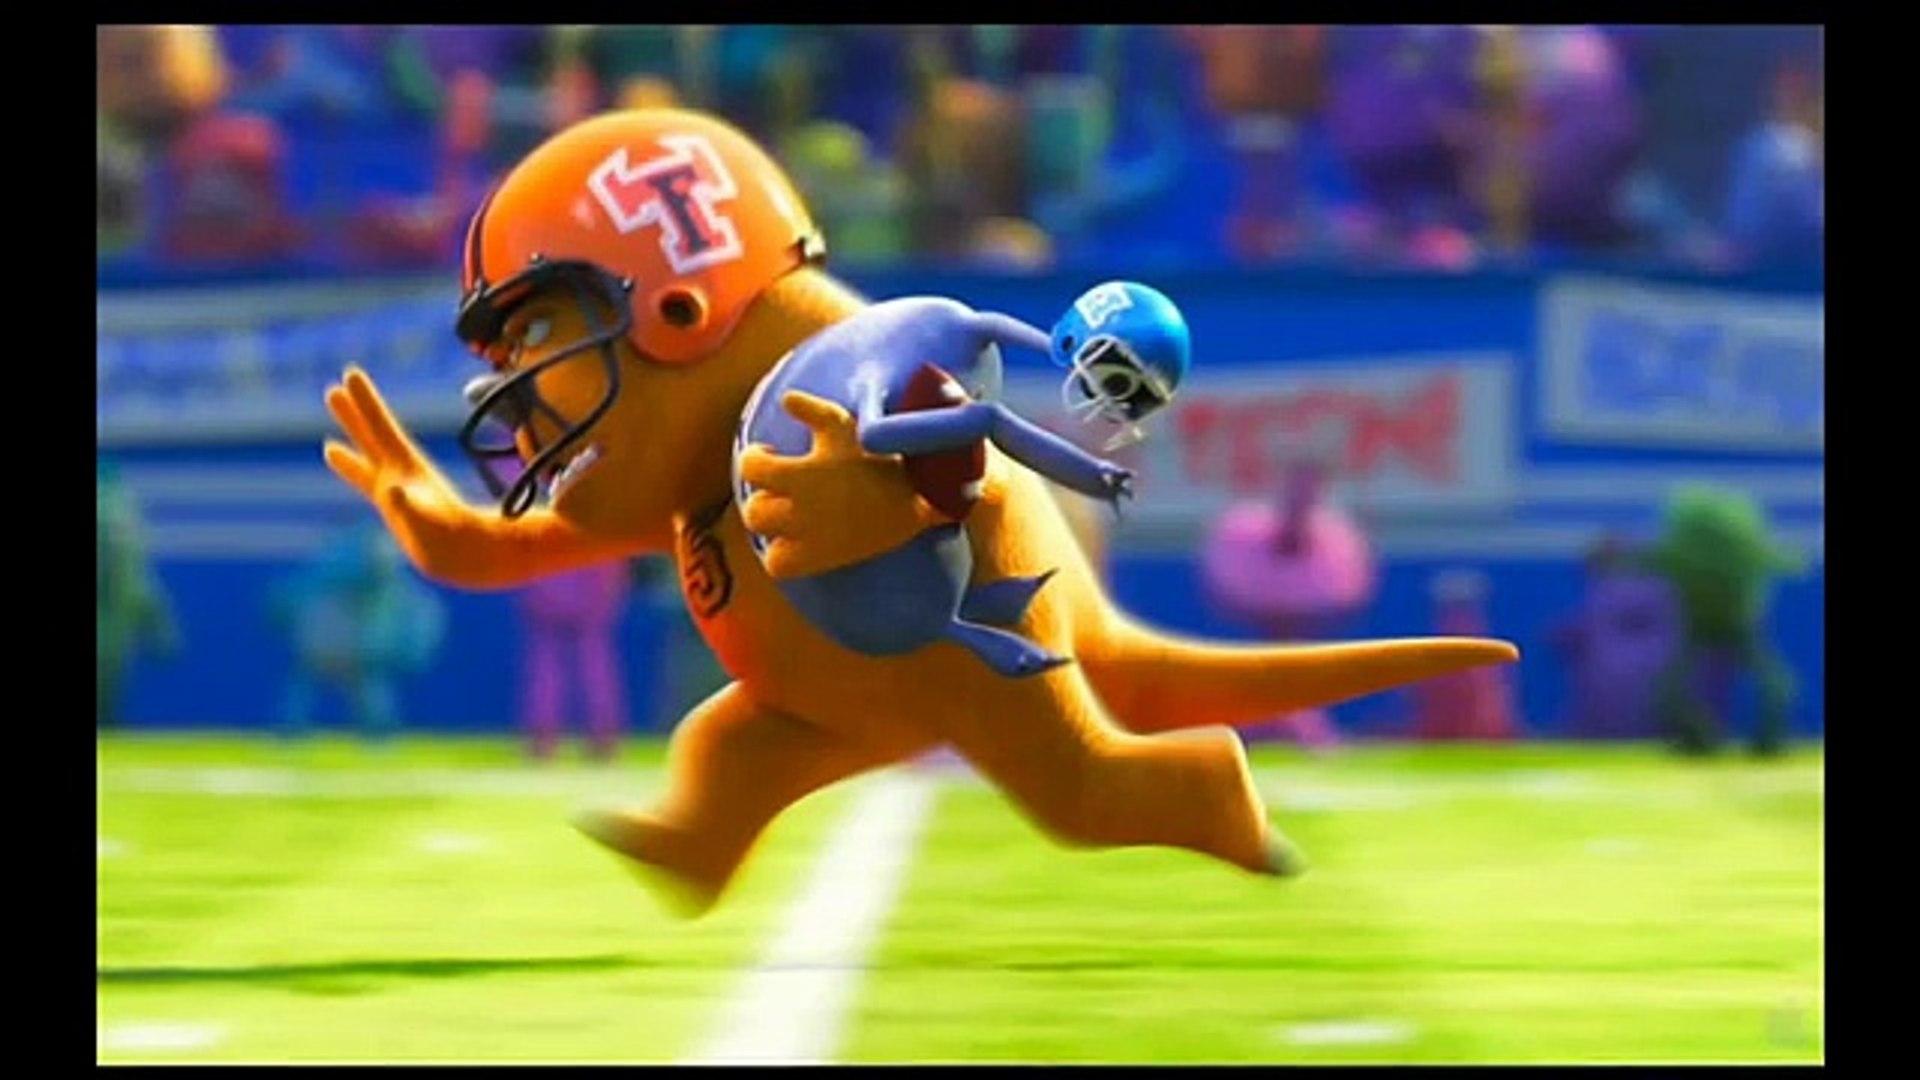 monsters university full Film hd animation Films disney Films cartoon Films full 2014